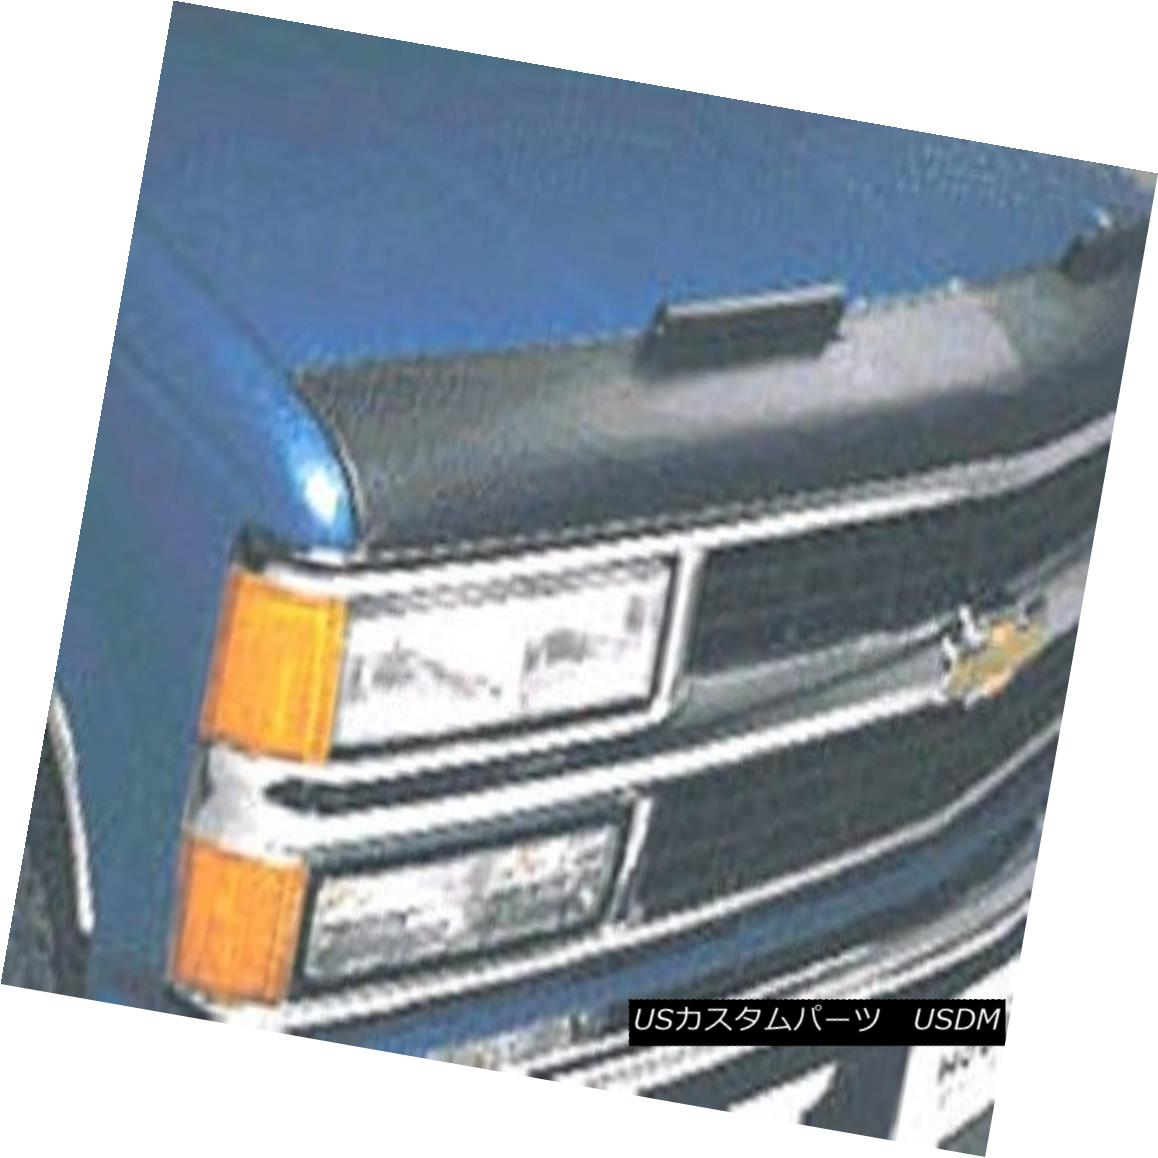 Colgan Front End Mask Bra 2pc Fits Audi A5 08-12 Quattro 2dr w//License Plate